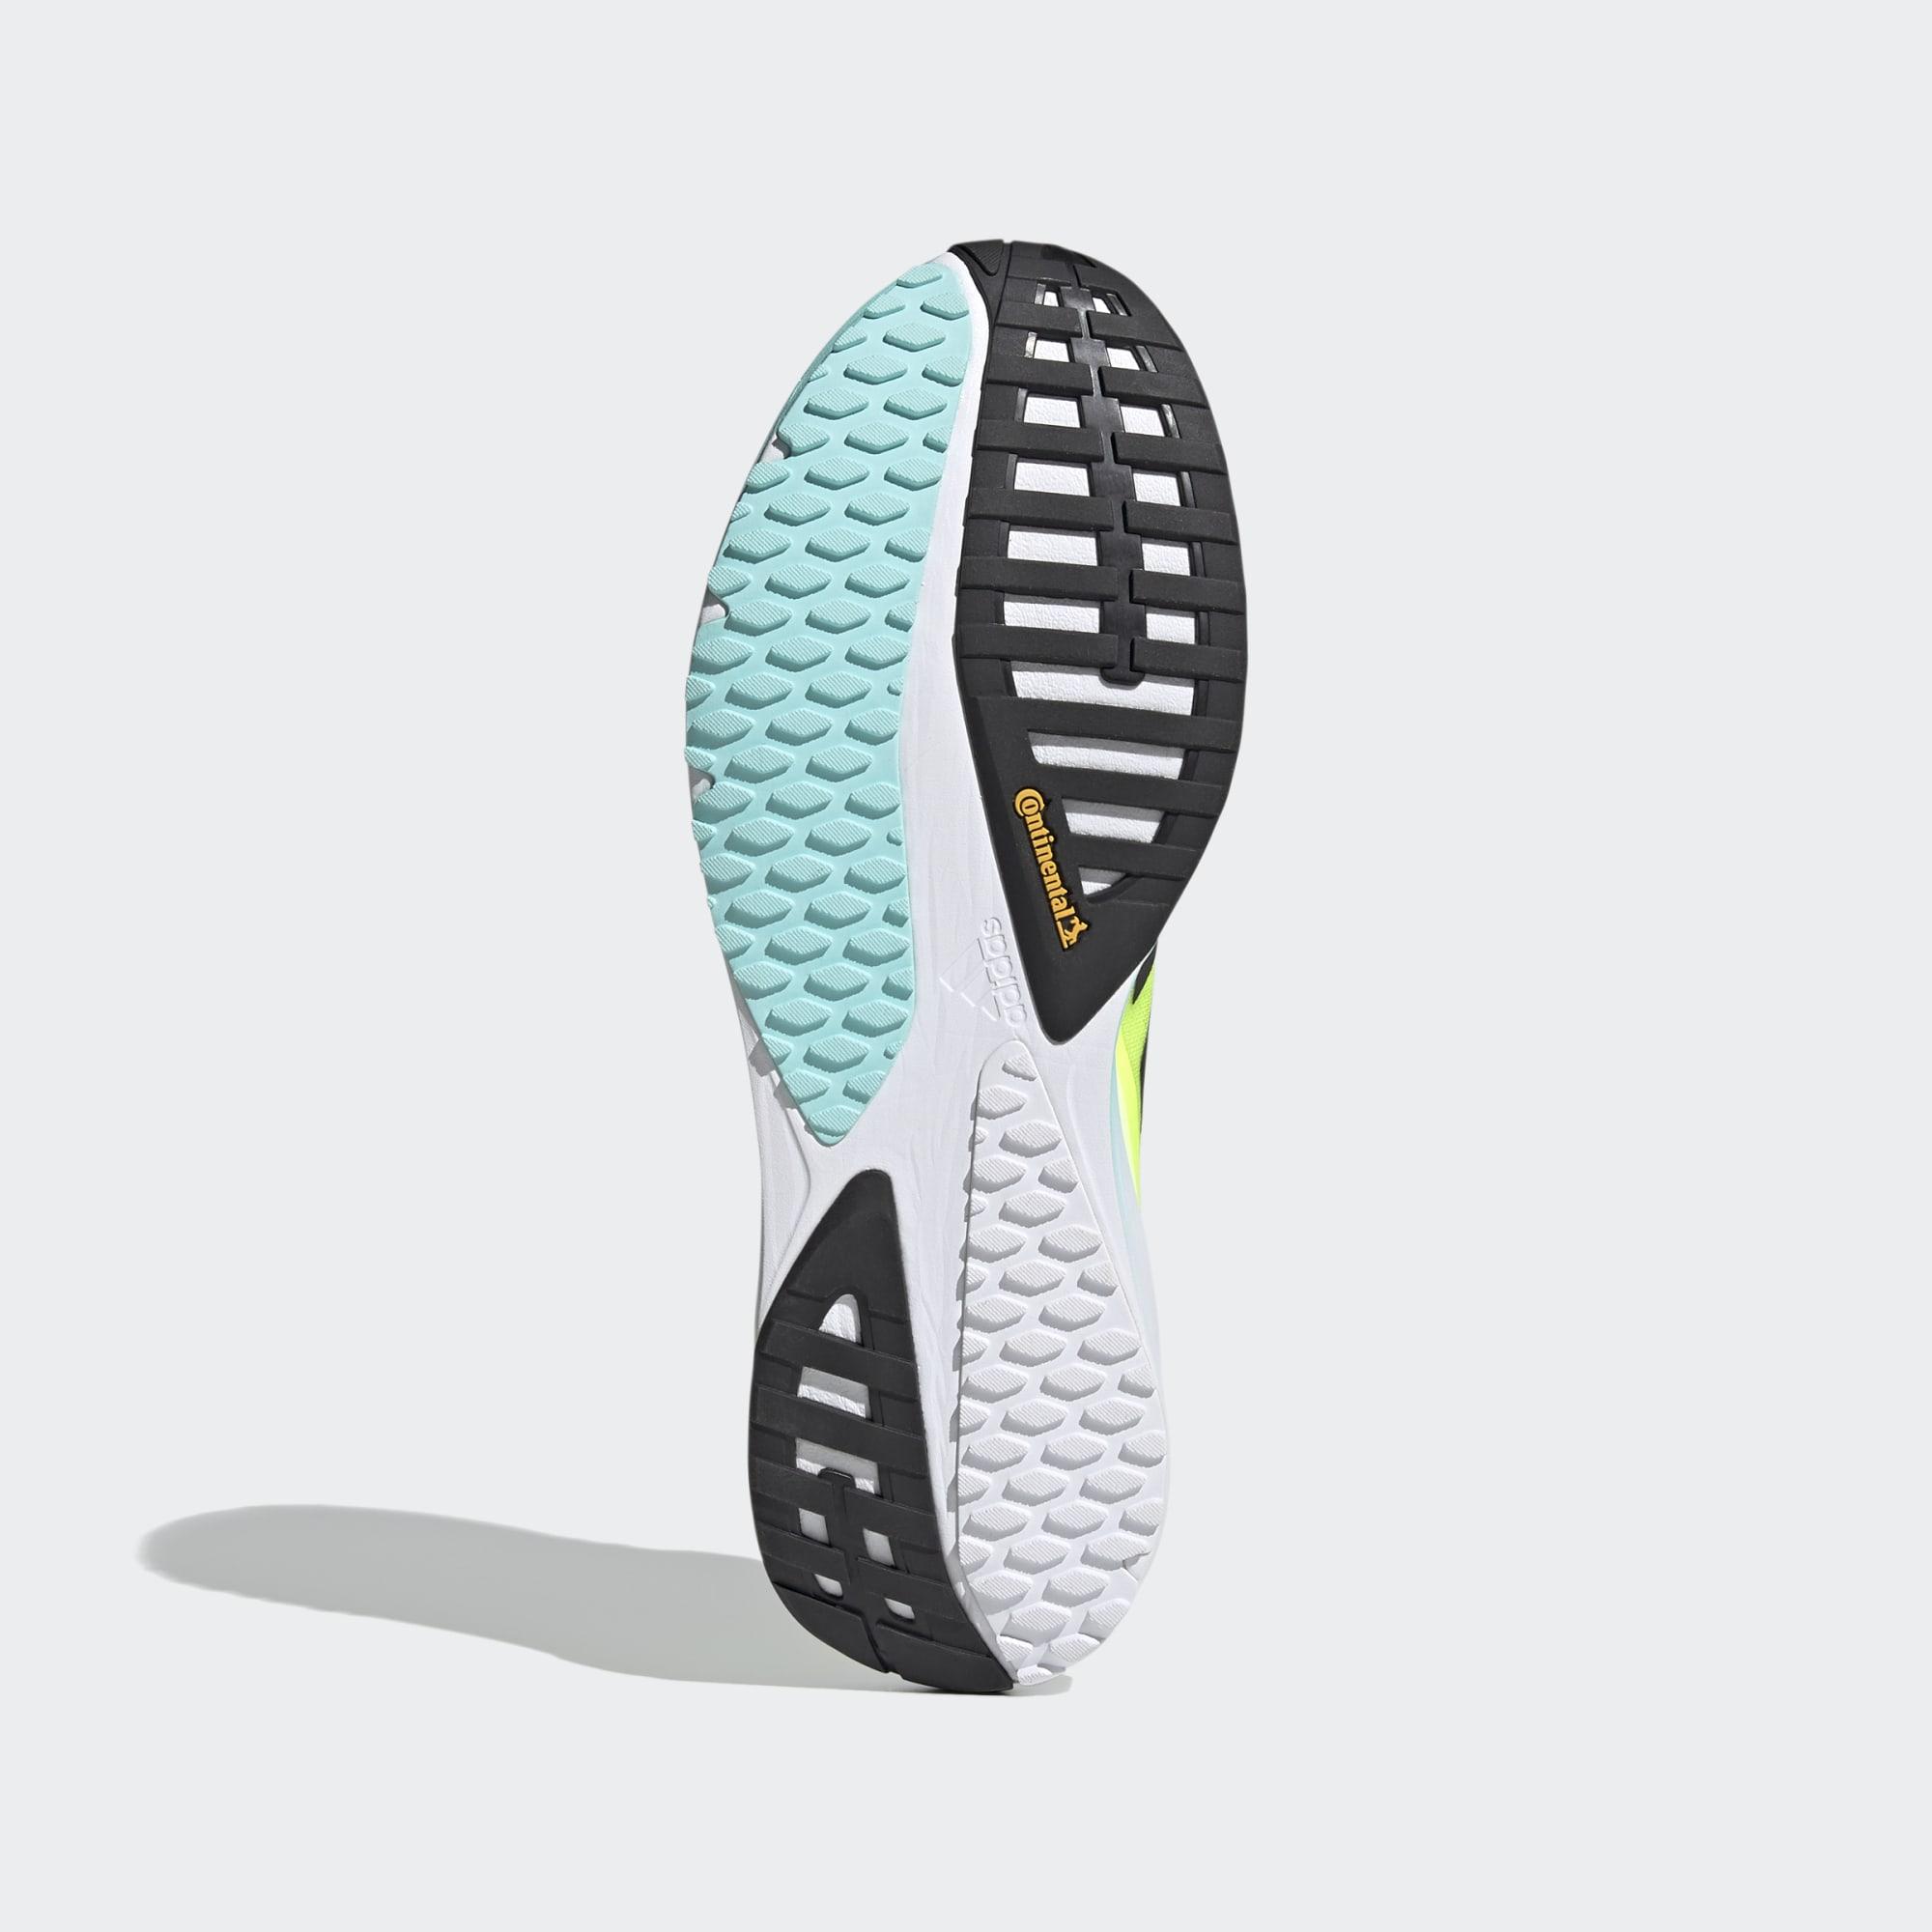 Adidas SL20 sko, yellow/black/aqua, 45 1/3